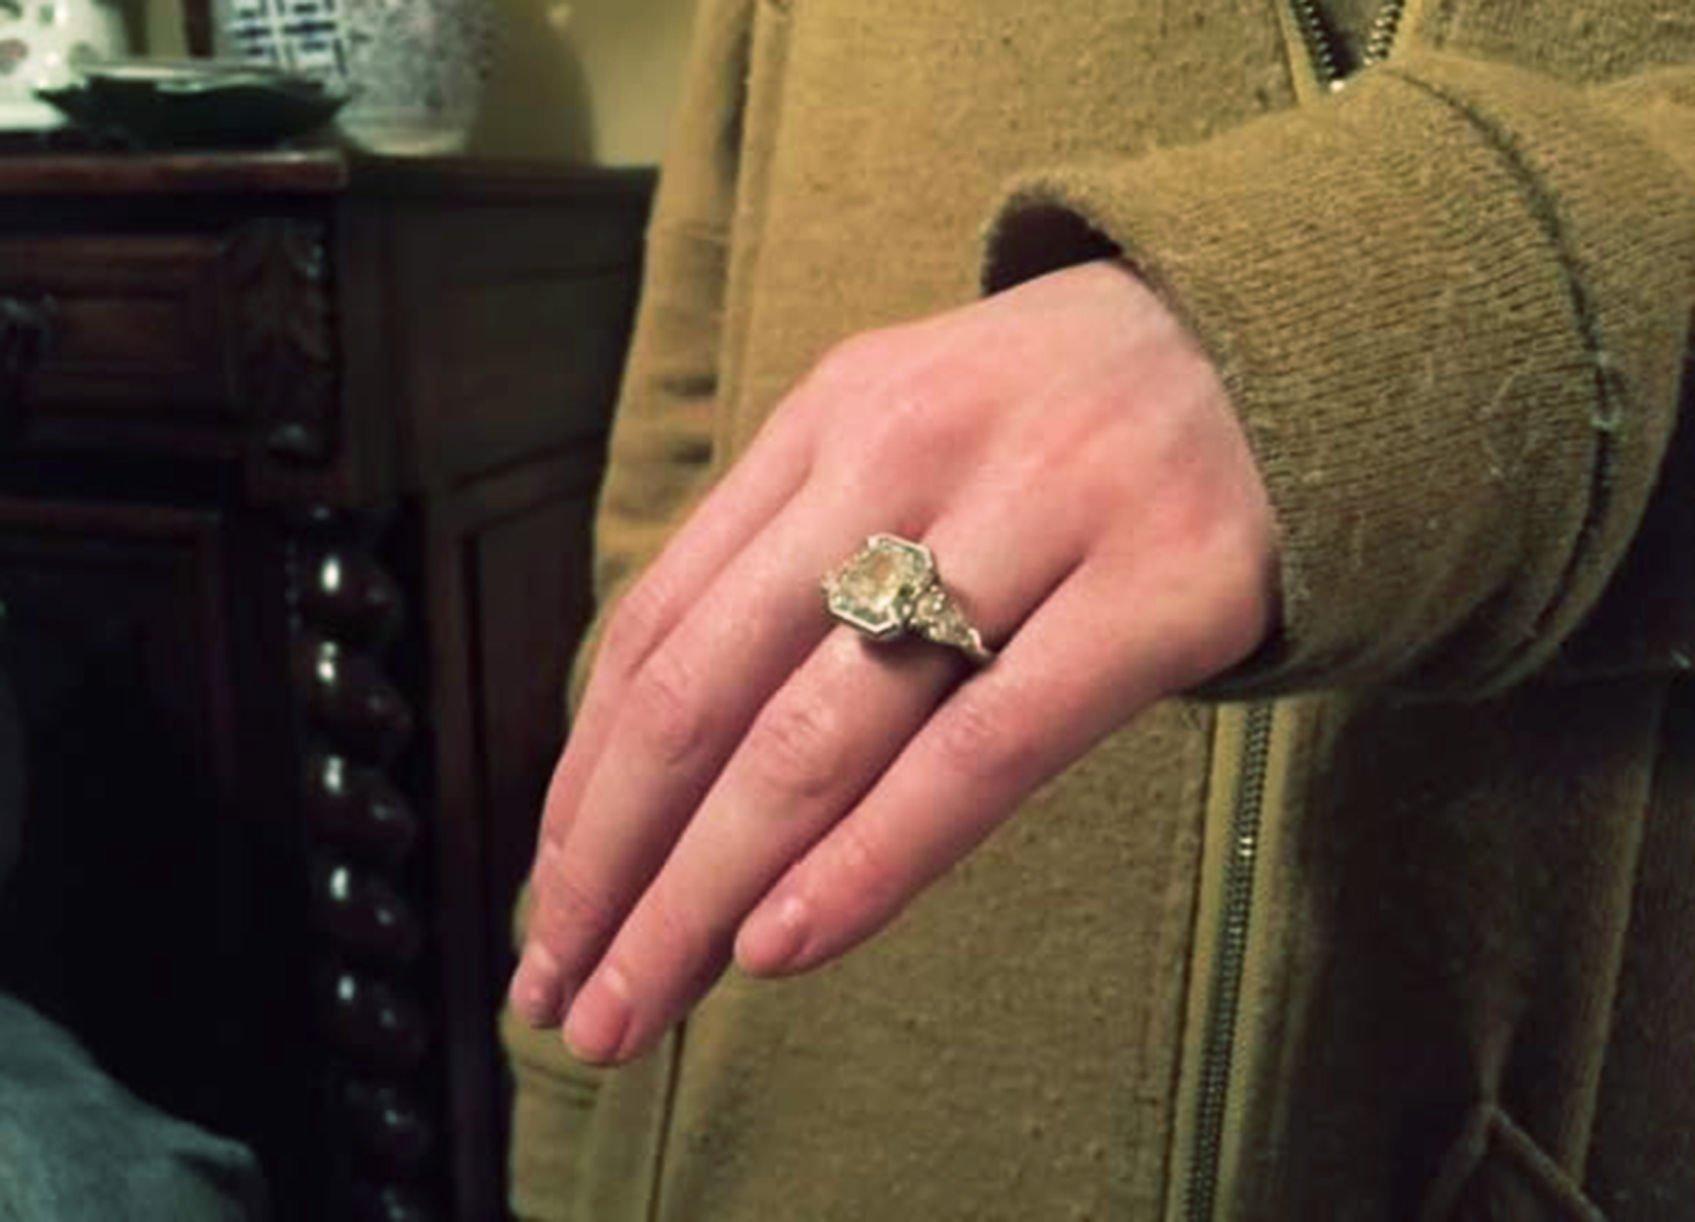 Former Mayor Kathy Taylor loses 4 million blue diamond ring files